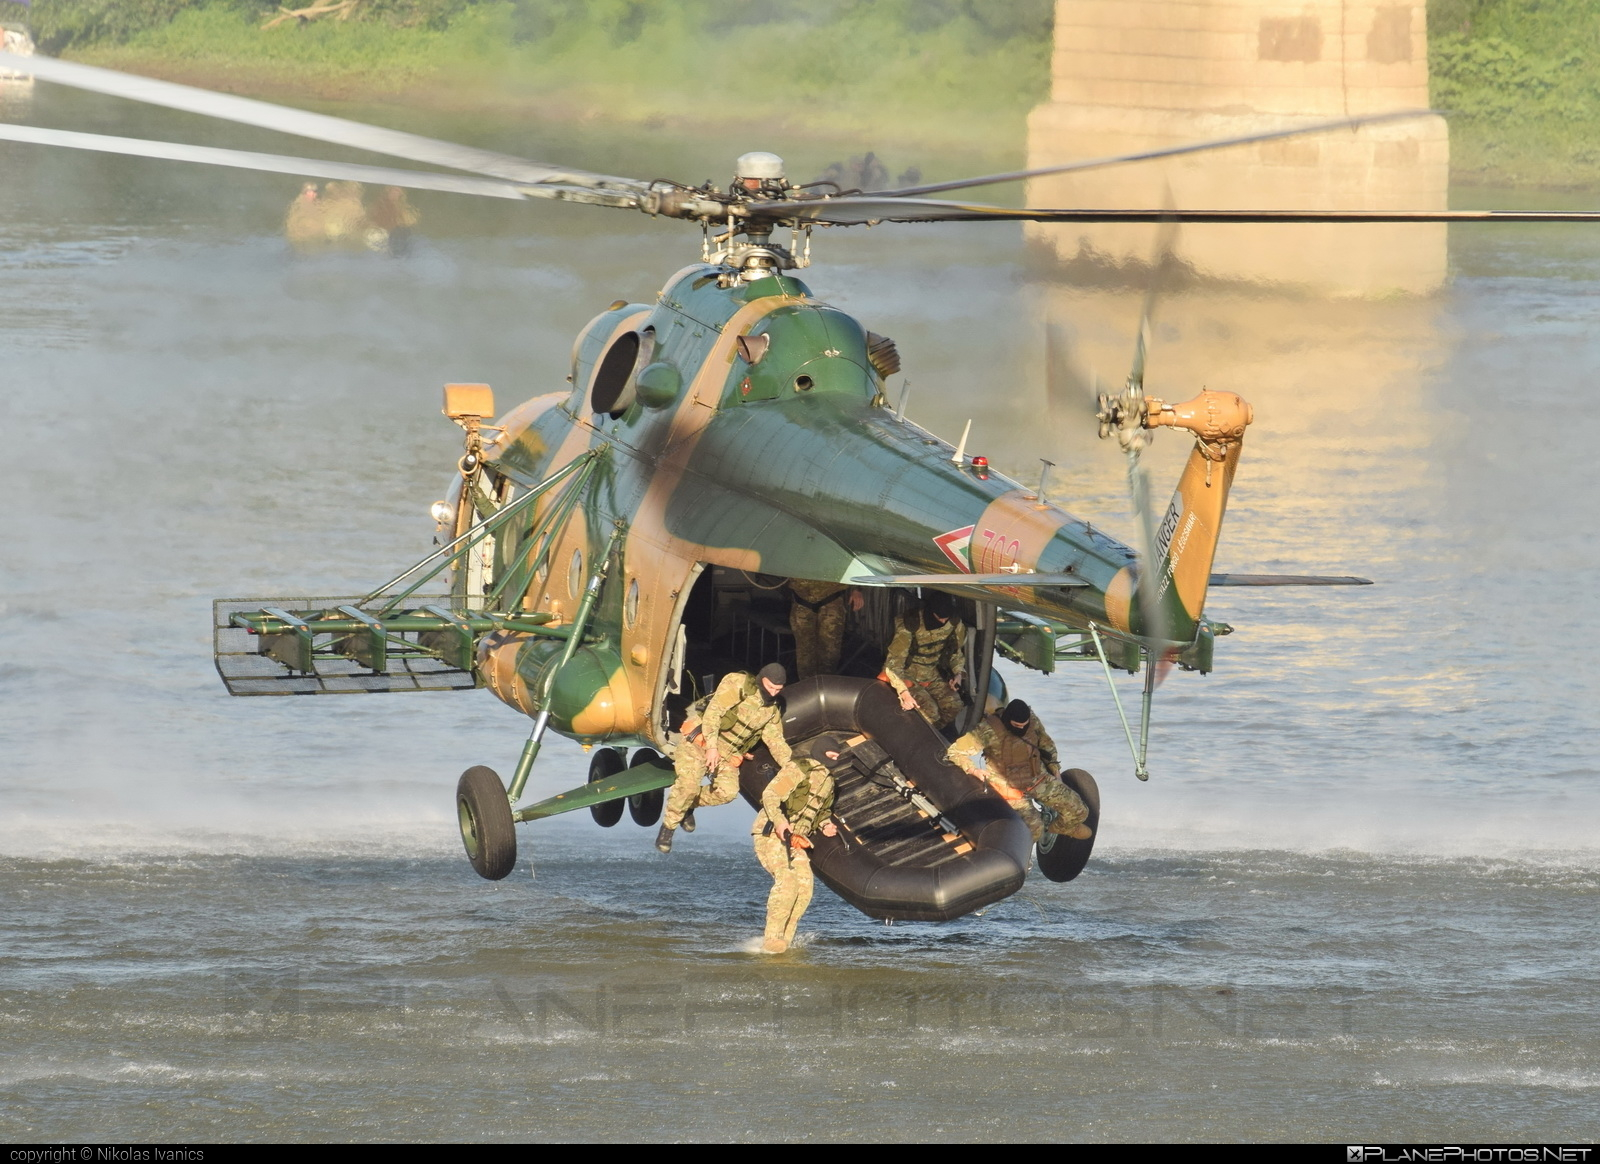 Mil Mi-17 - 702 operated by Magyar Légierő (Hungarian Air Force) #hungarianairforce #magyarlegiero #mi17 #mil #mil17 #milhelicopters